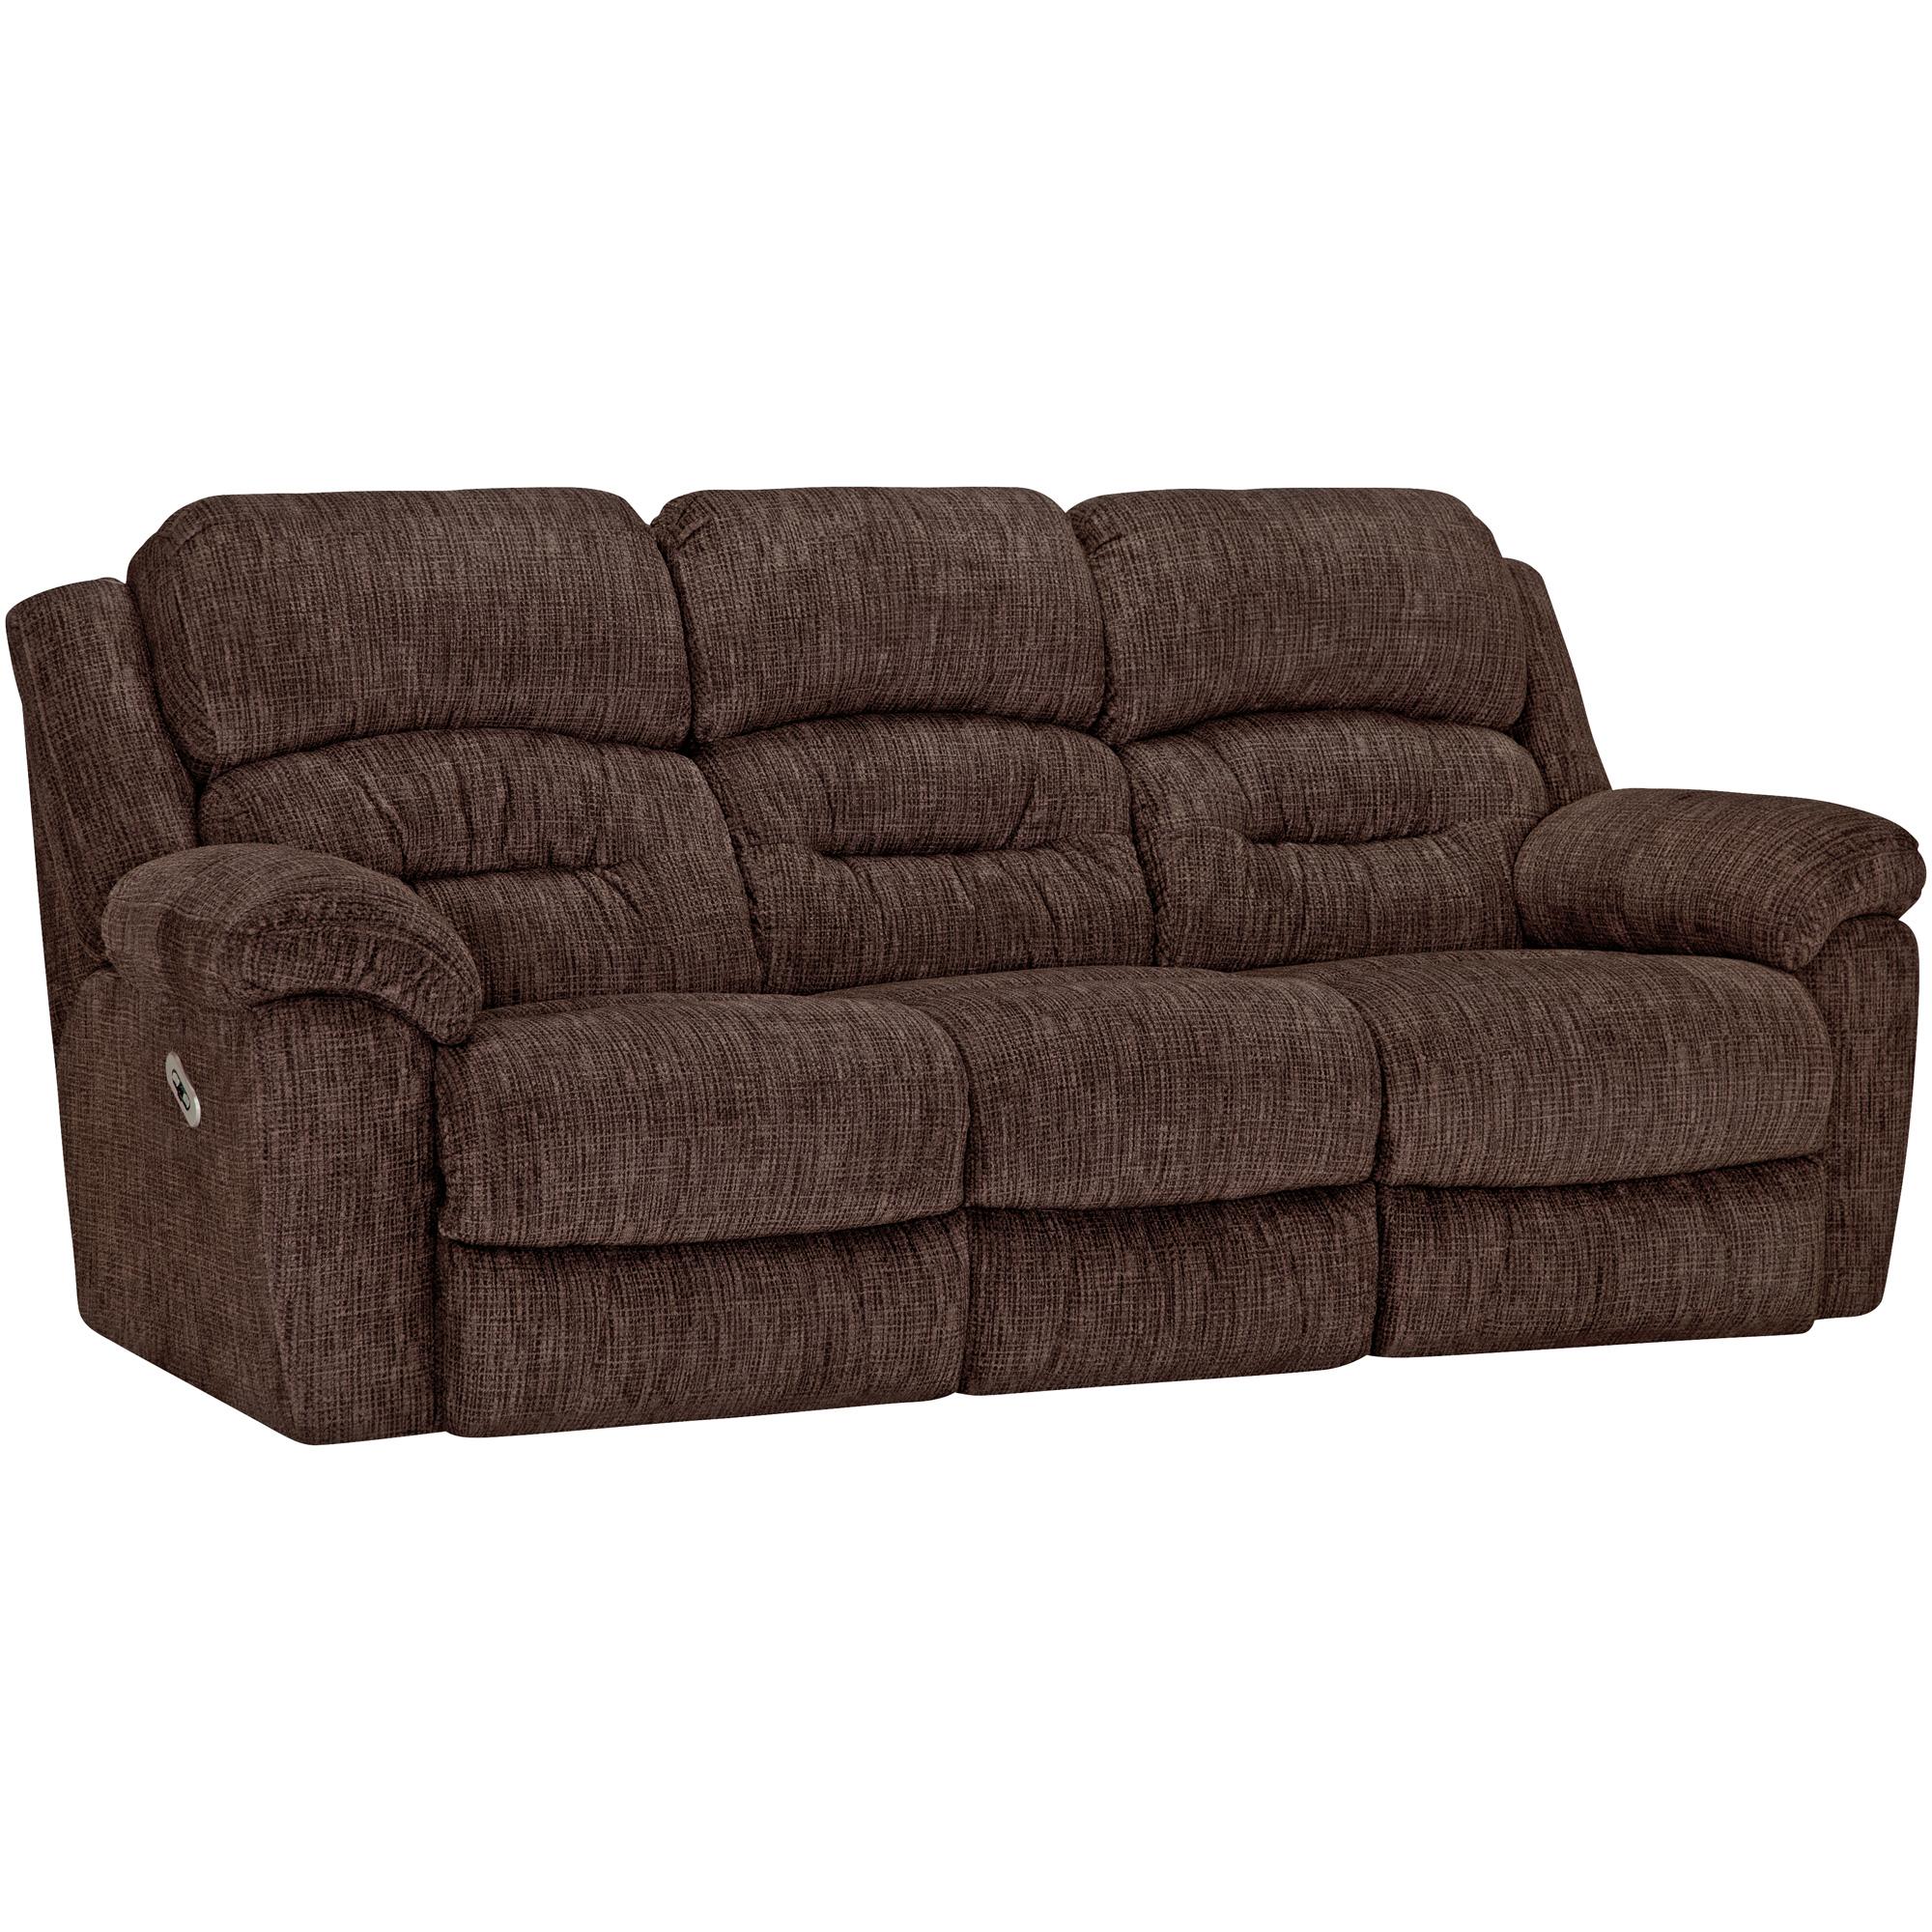 Franklin | Frontier Brown Power Reclining Sofa